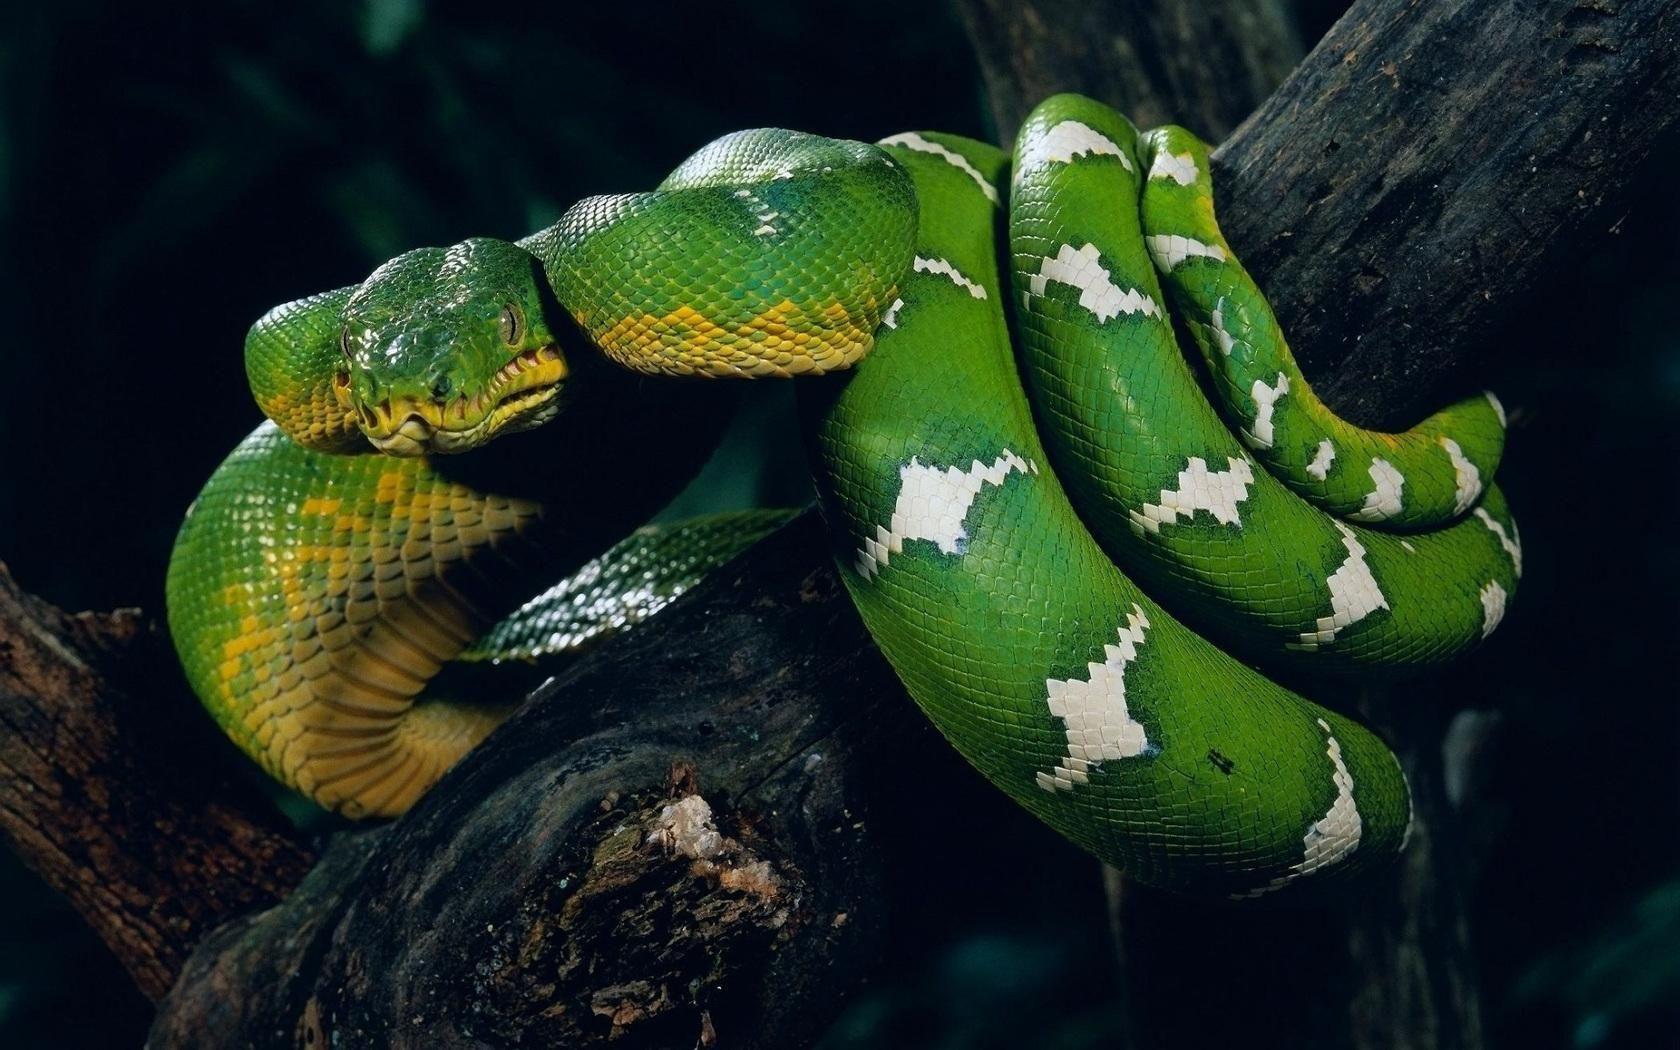 Wallpapers Anaconda Wallpaper HD Wallpapers  Snake